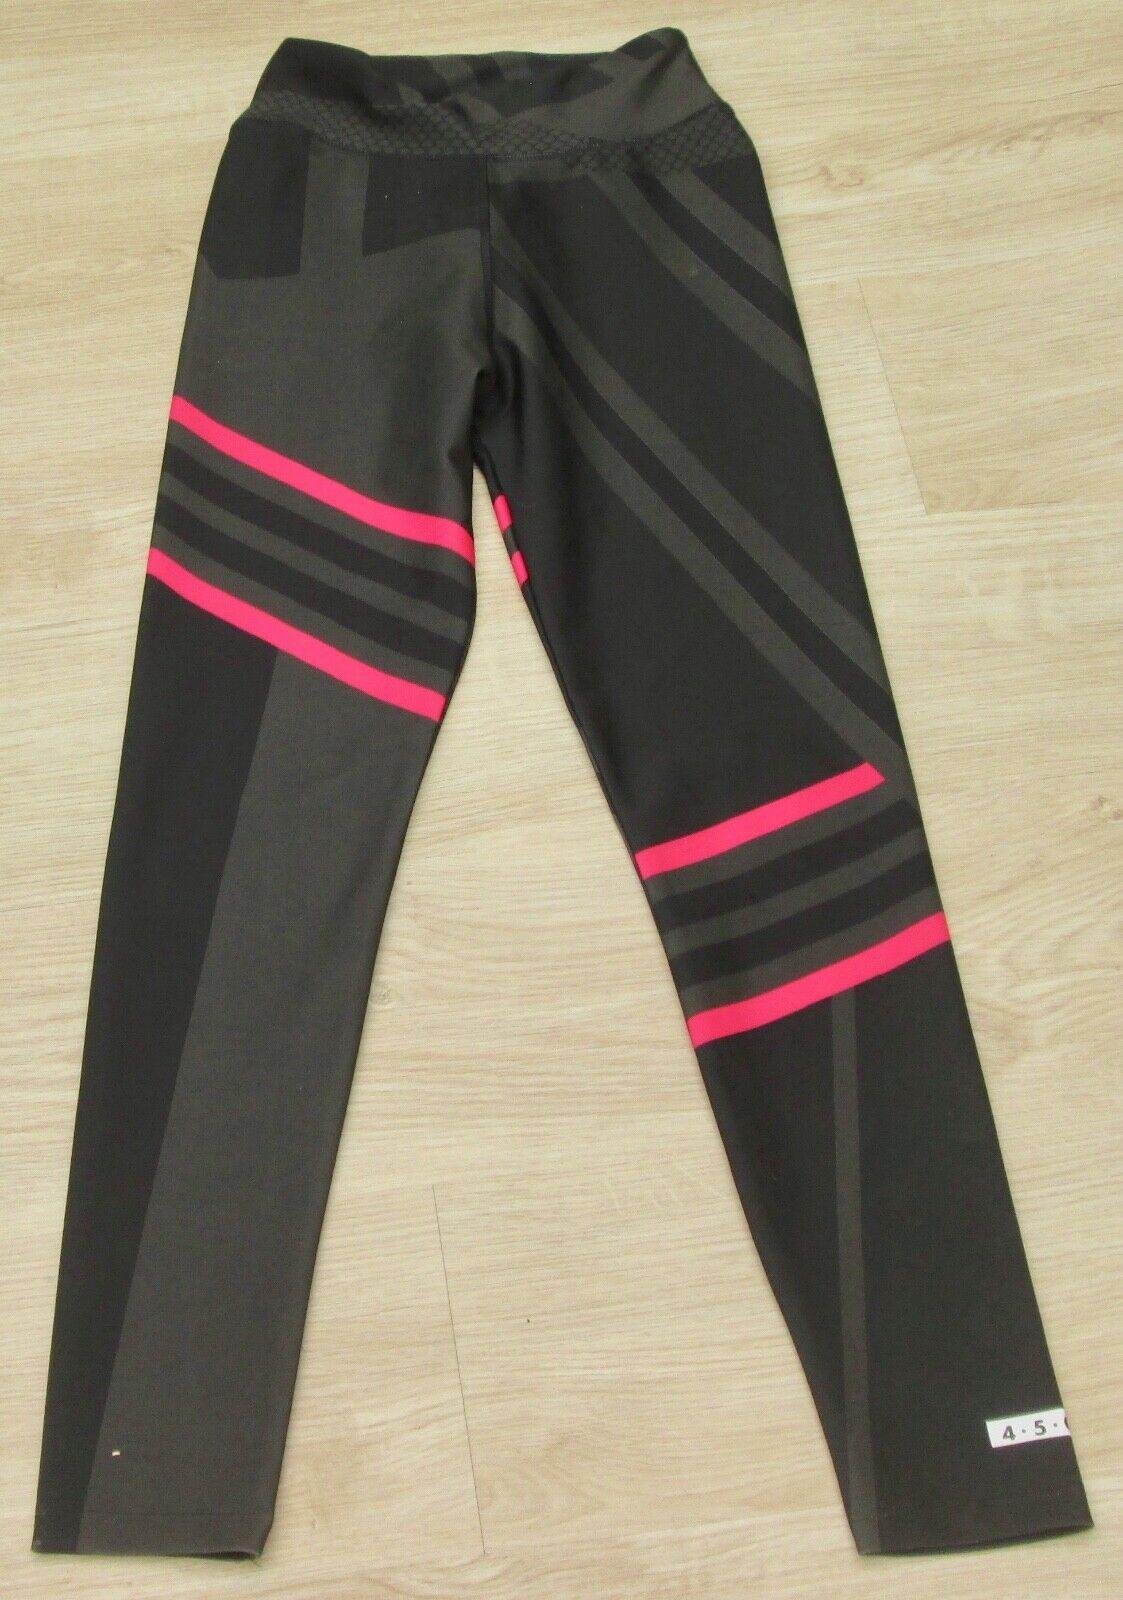 ASOS tolle Leggings schwarz khaki pink geometrisch gemustert Gr 36 NEUw